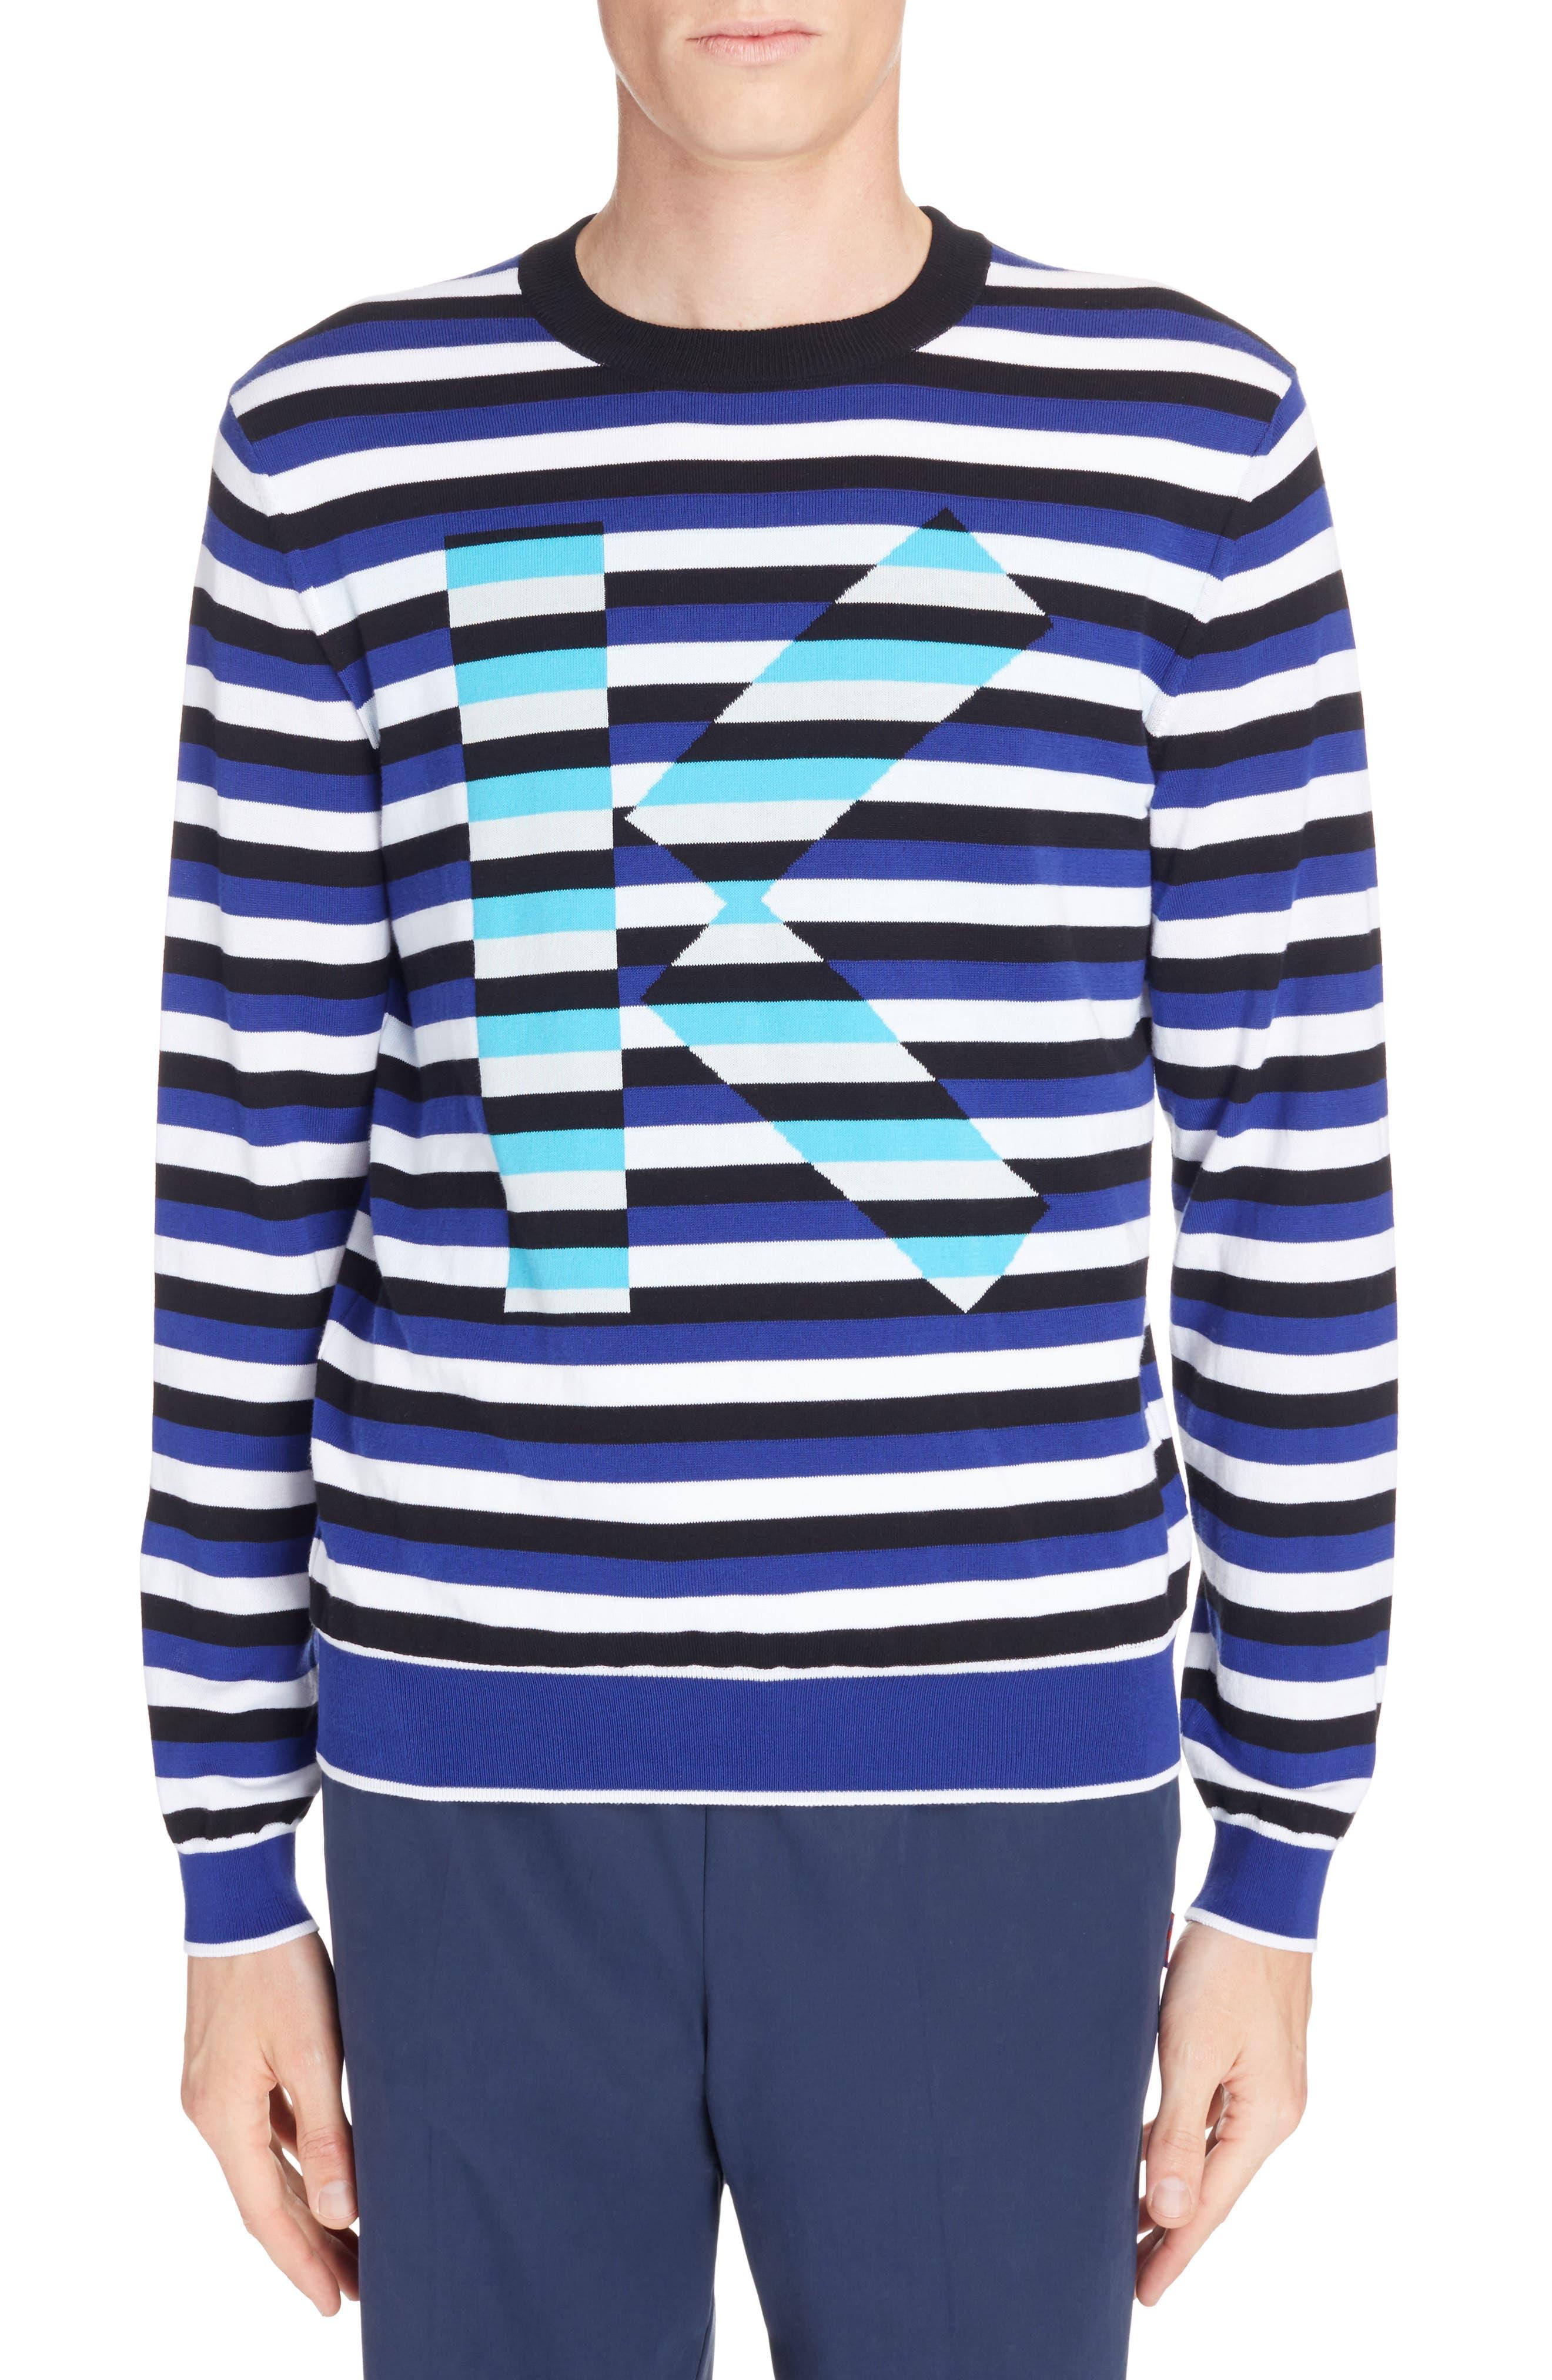 Large K Stripe Sweater,                         Main,                         color, 422